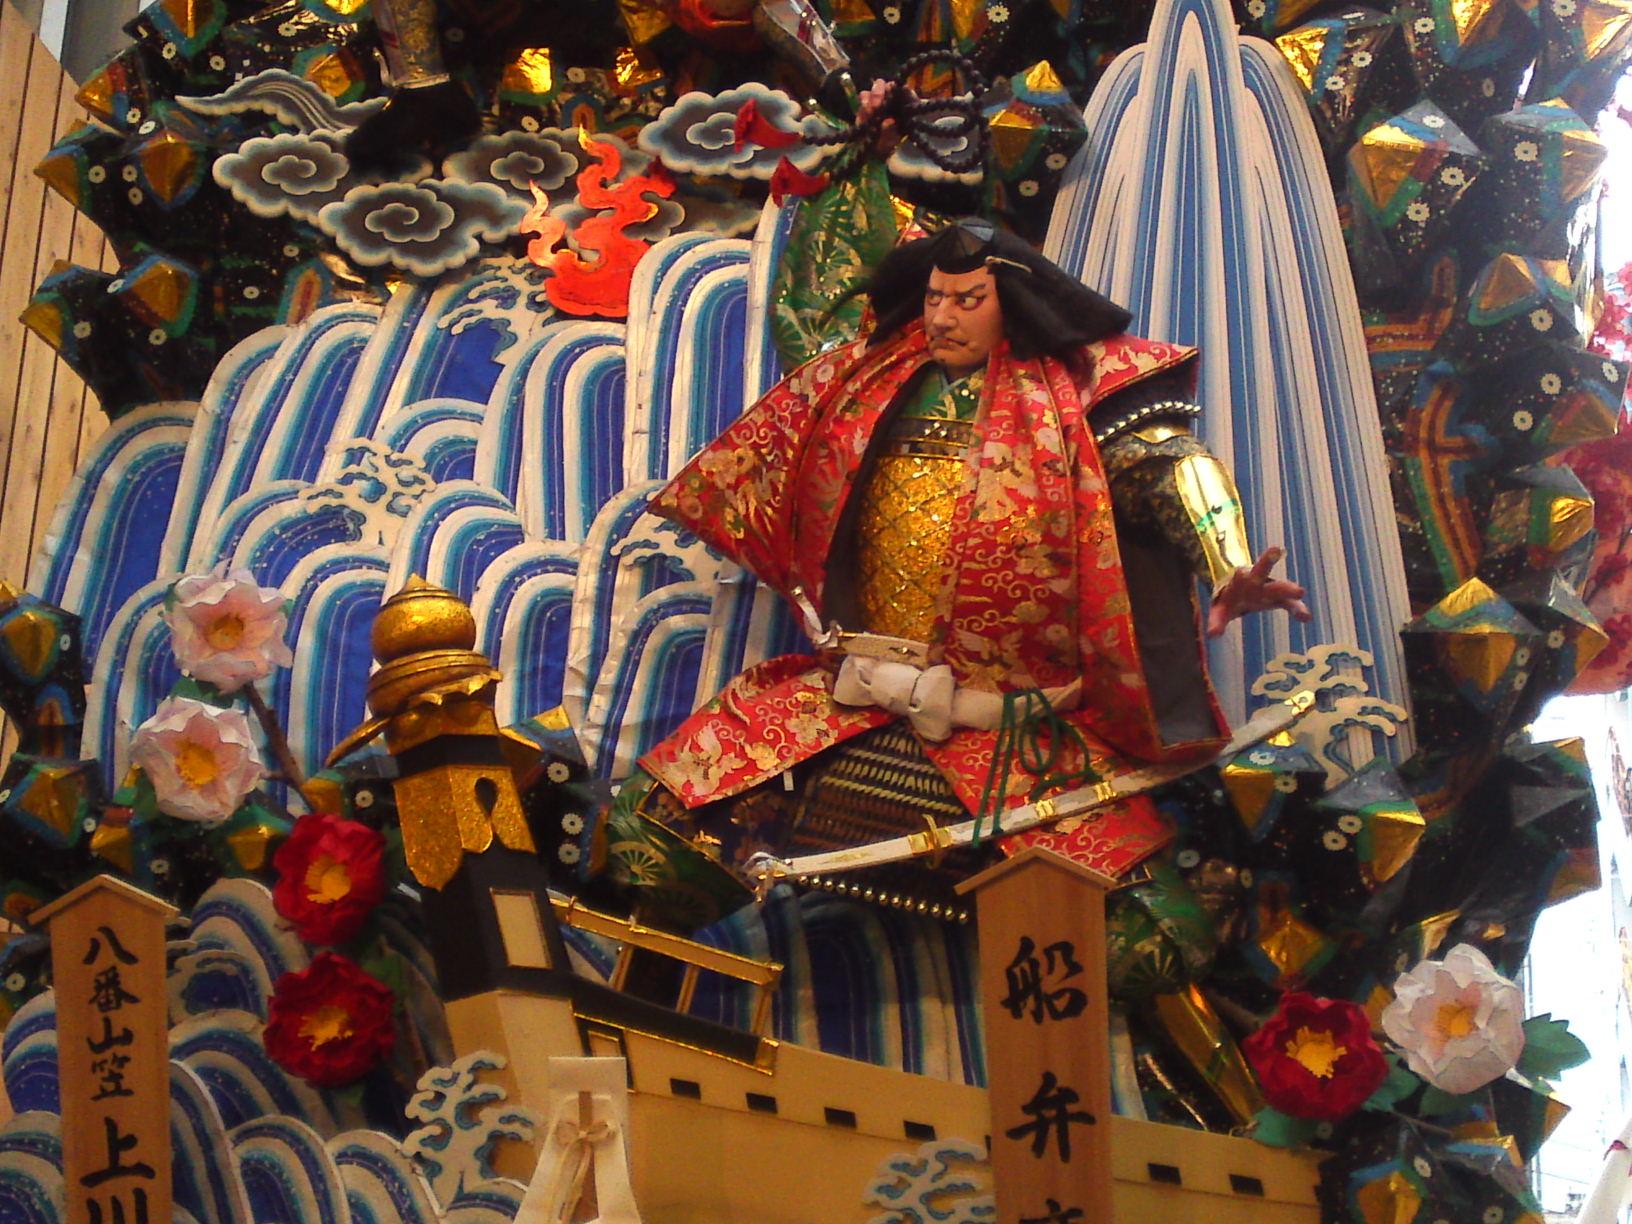 The Giant Floats of Hakata Gion Yamakasa Festival, Fukuoka